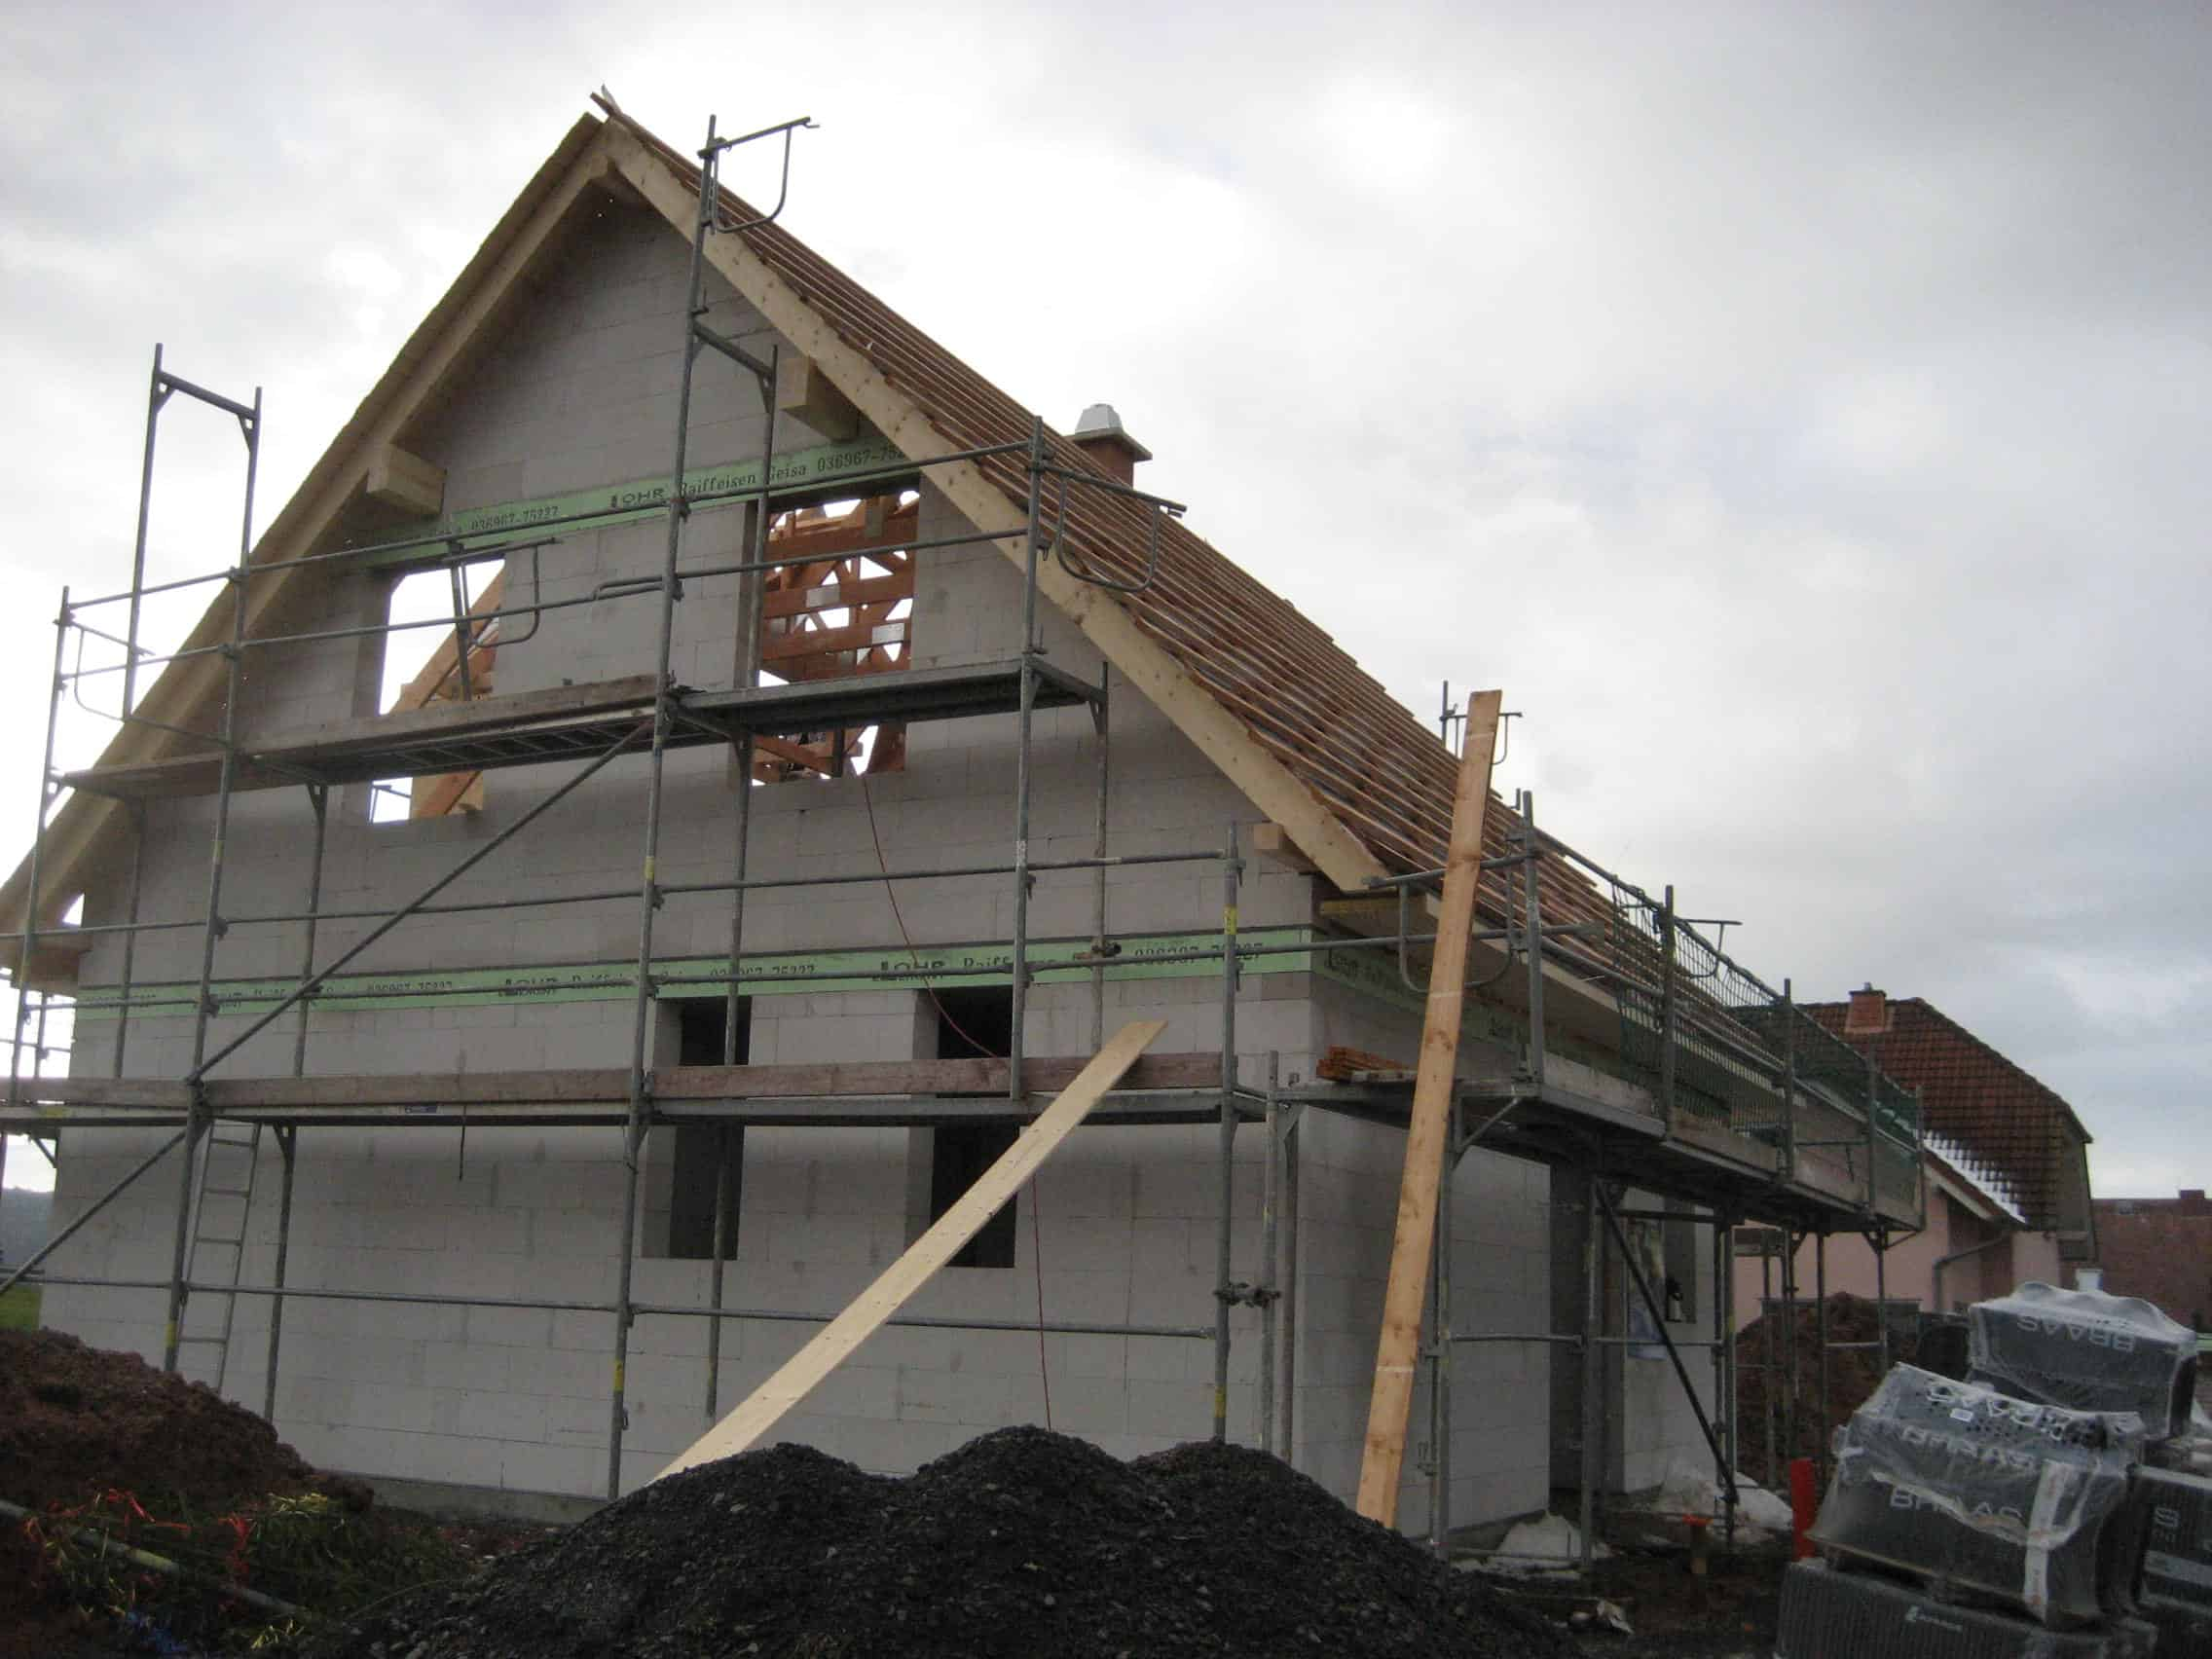 Einfamilienhaus in 36404 Vacha, OT Martinroda